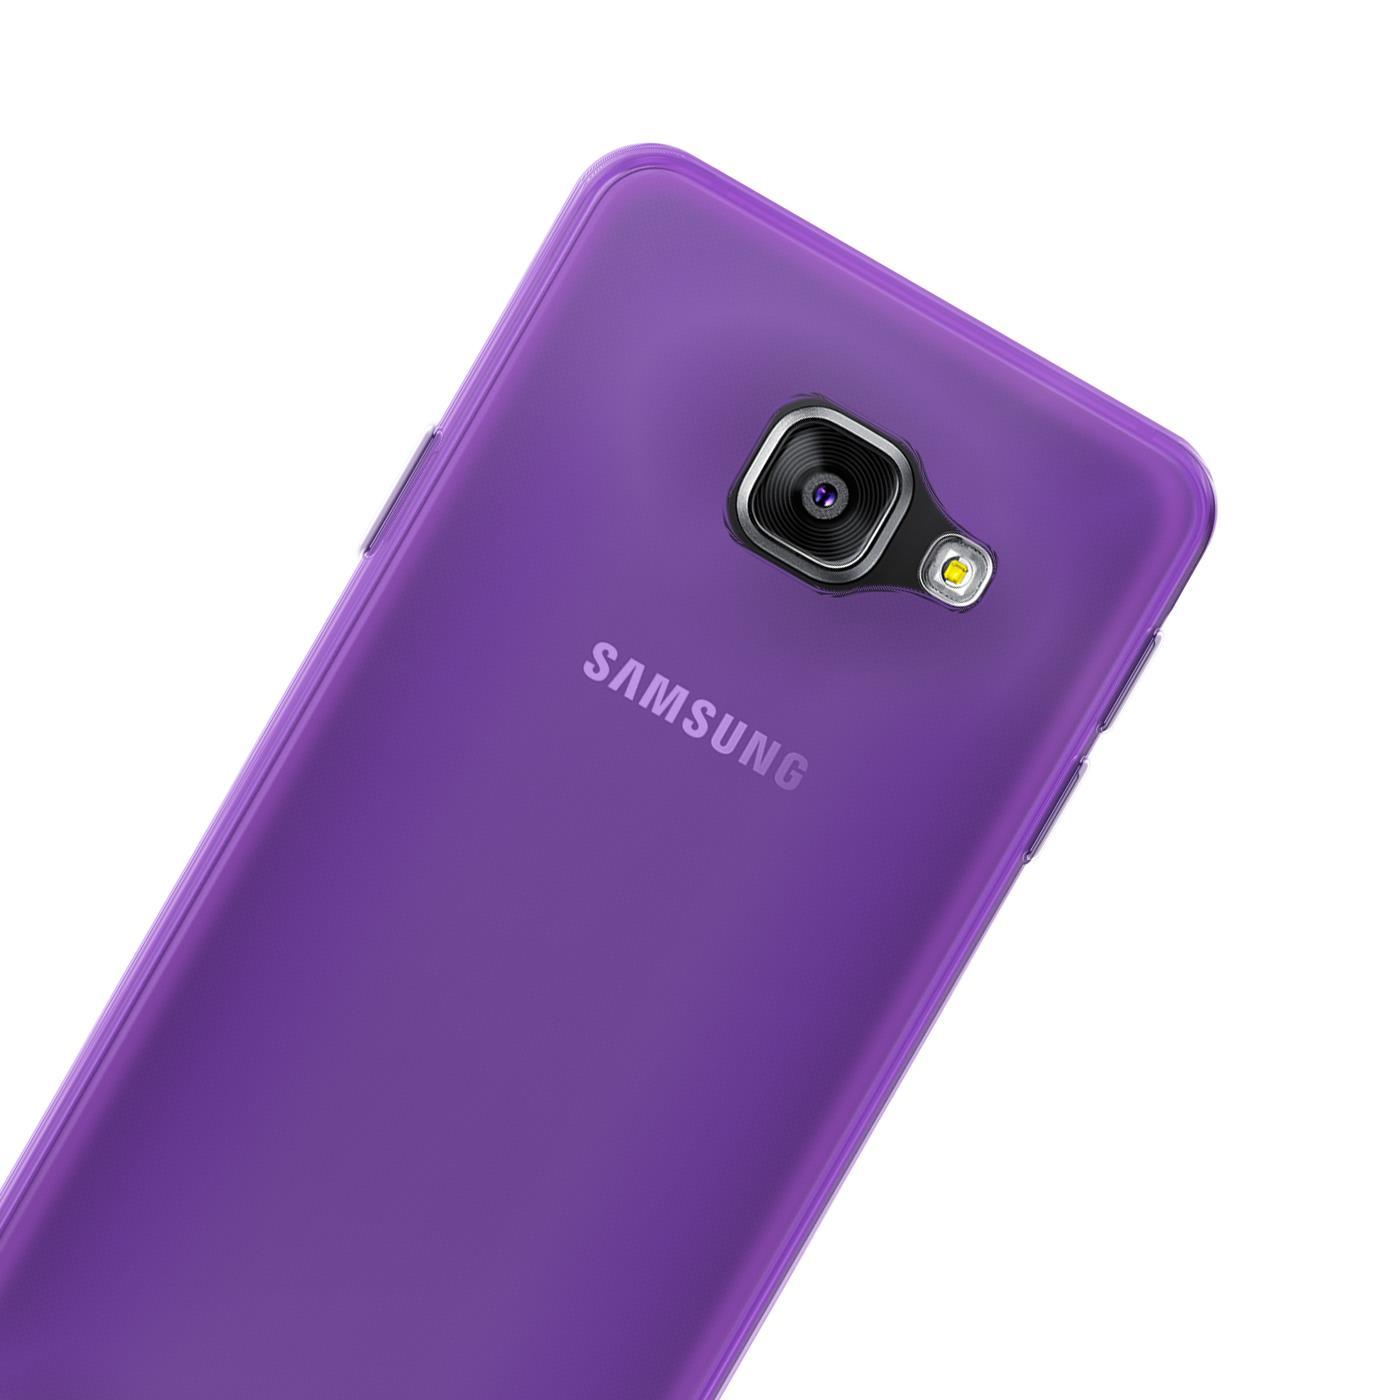 Samsung-Galaxy-a3-2016-Thin-Silikon-Klar-Case-Cover-Ultra-Slim-Stossfeste-Gel Indexbild 22